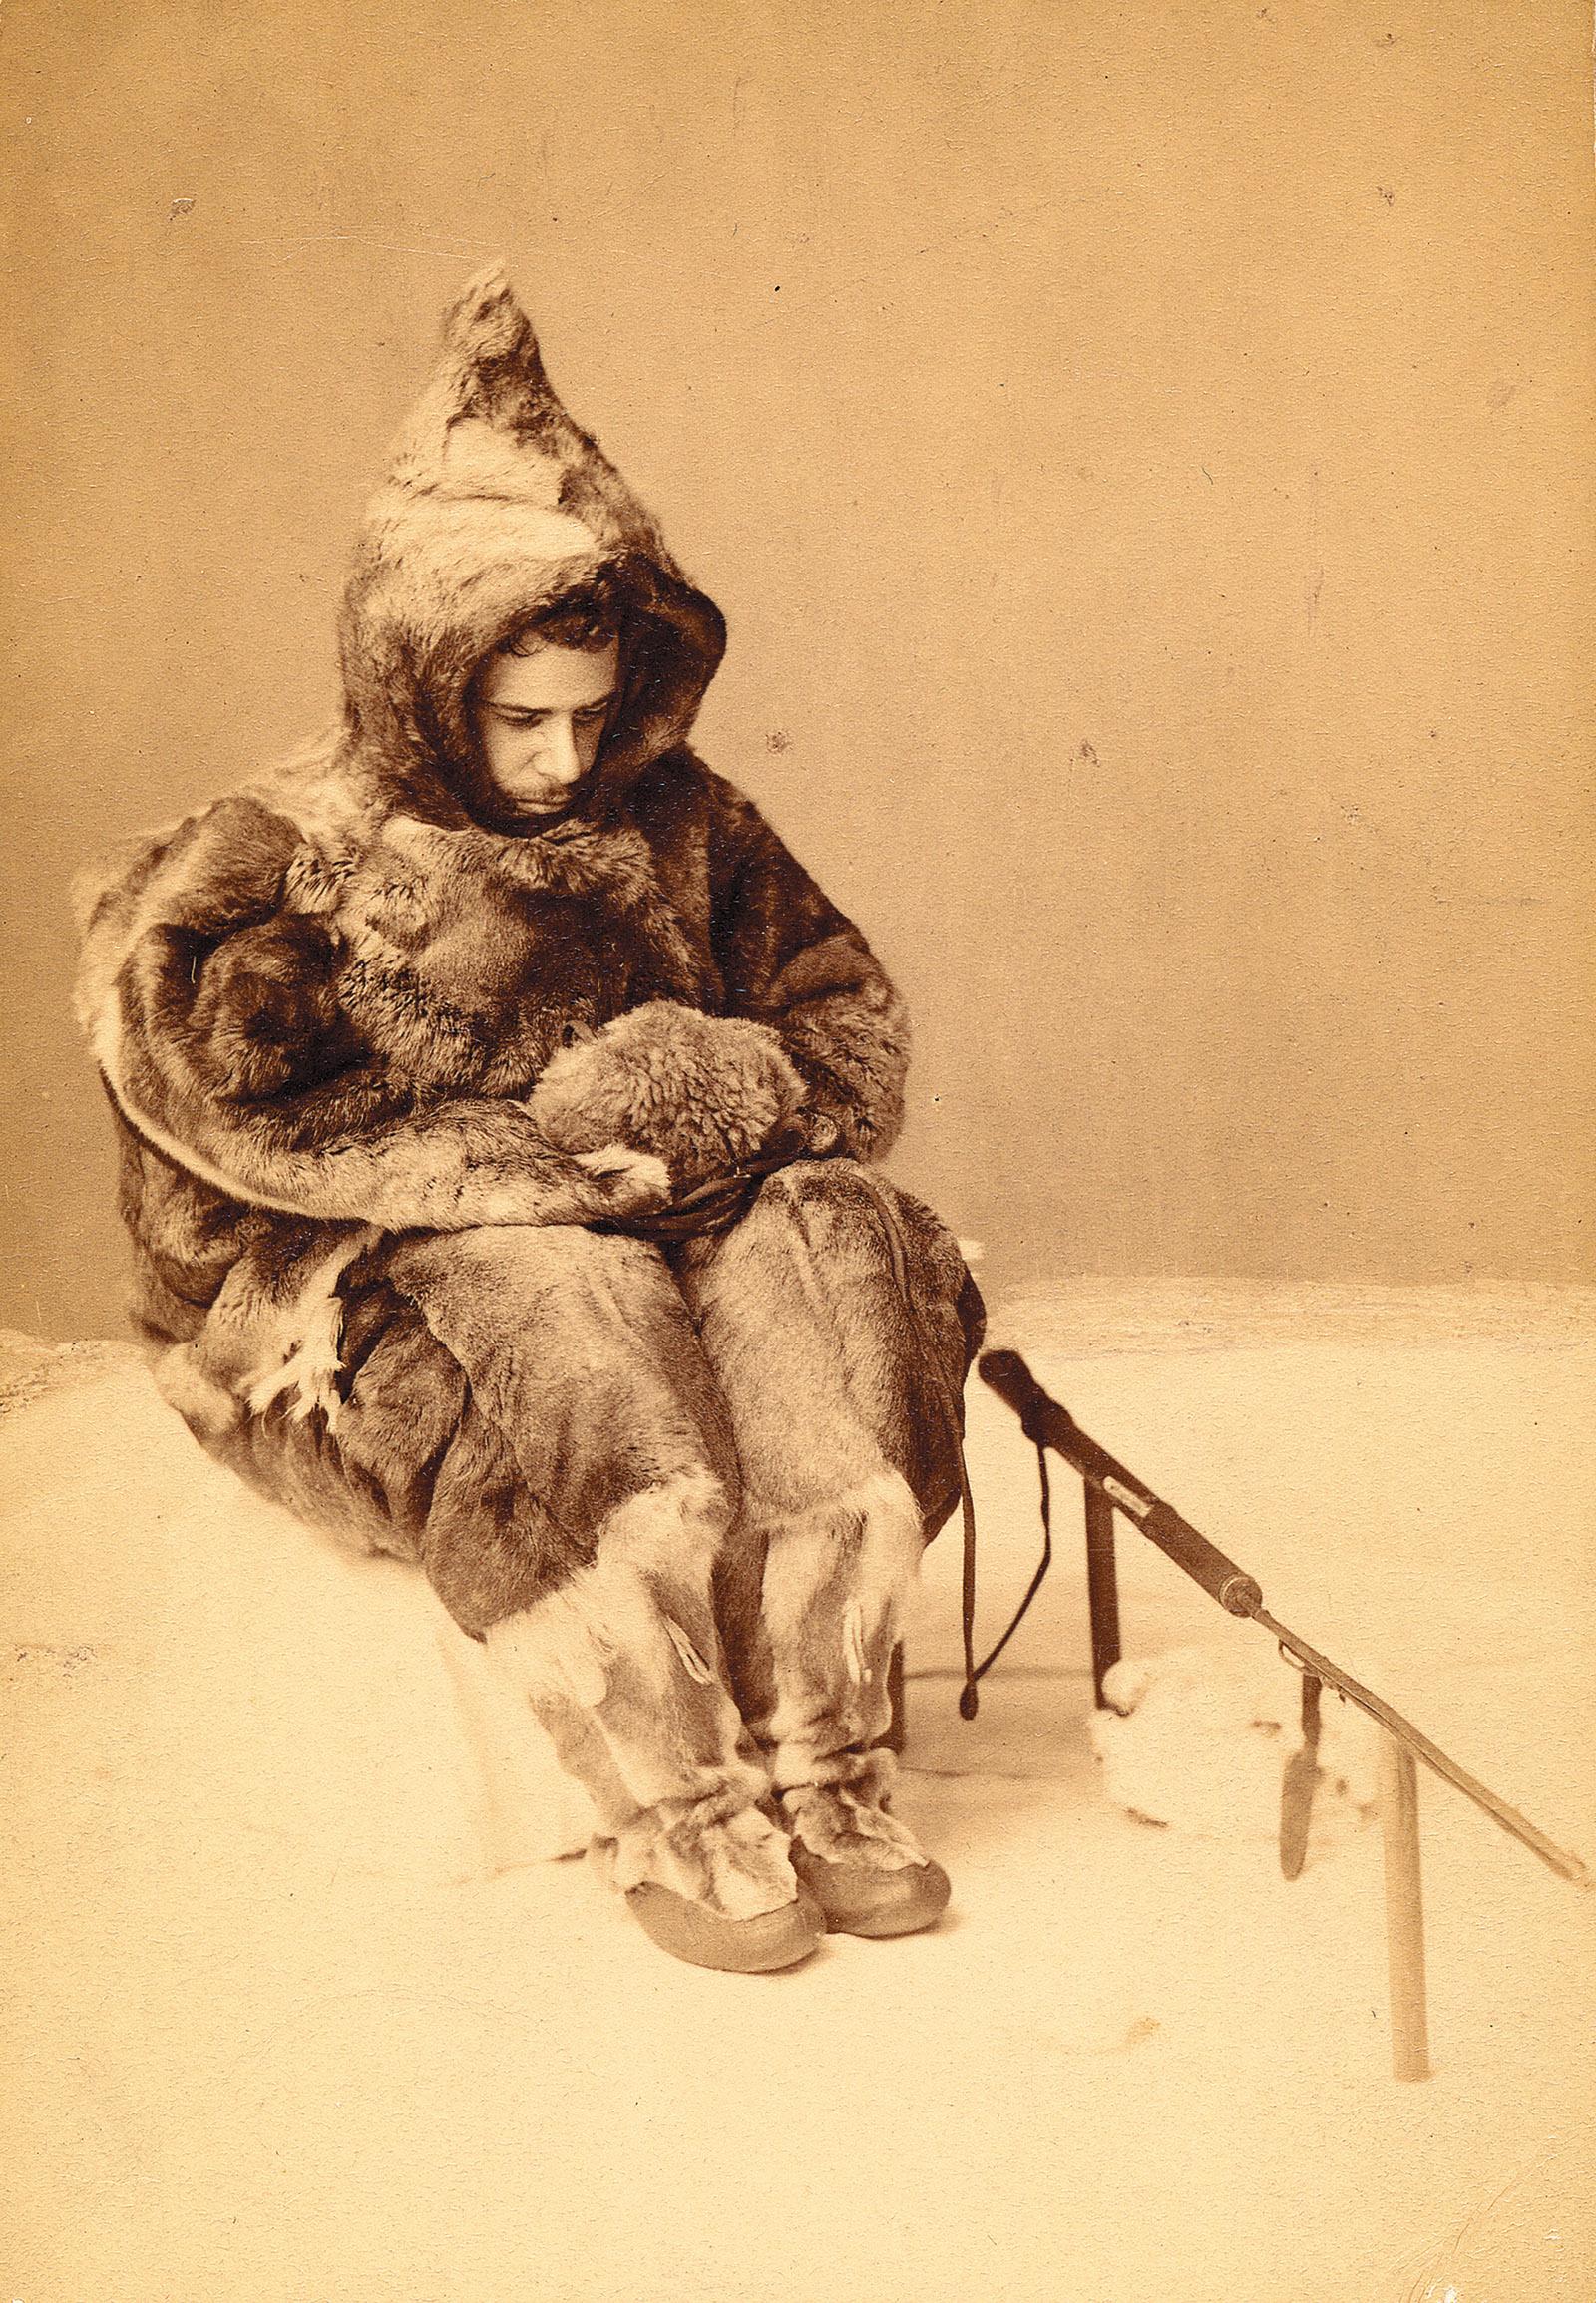 Franz Boas posing in Inuit garments